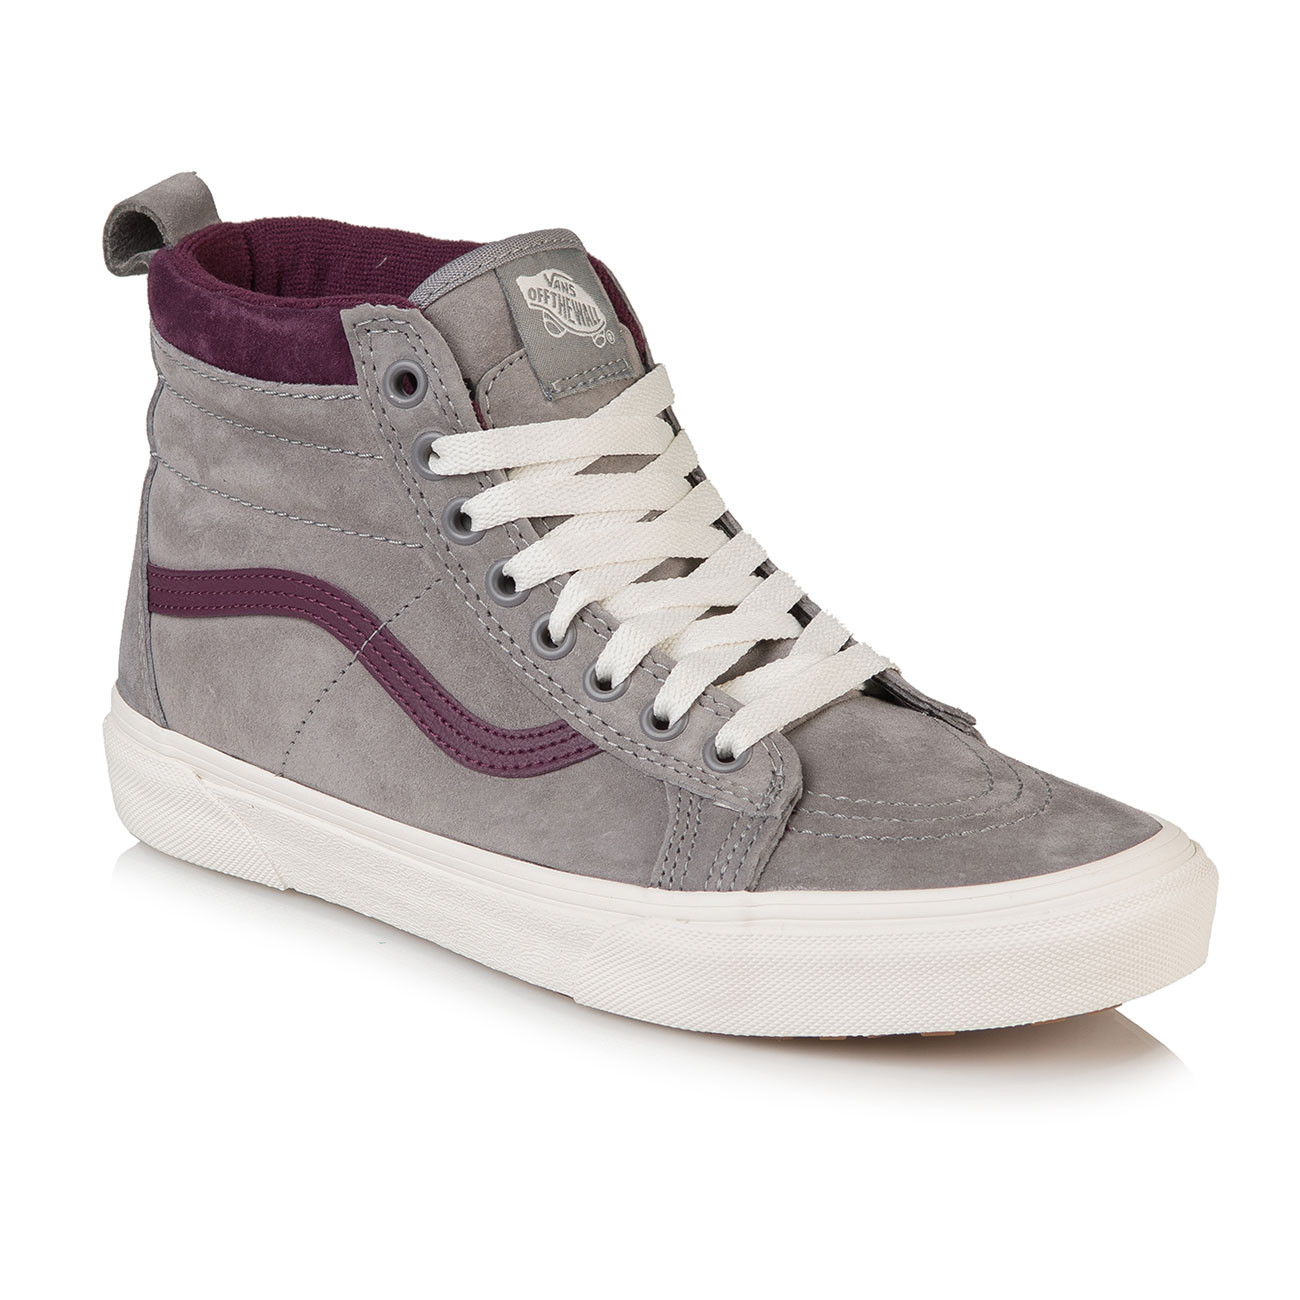 Winter shoes Vans Sk8-Hi MTE frost grey